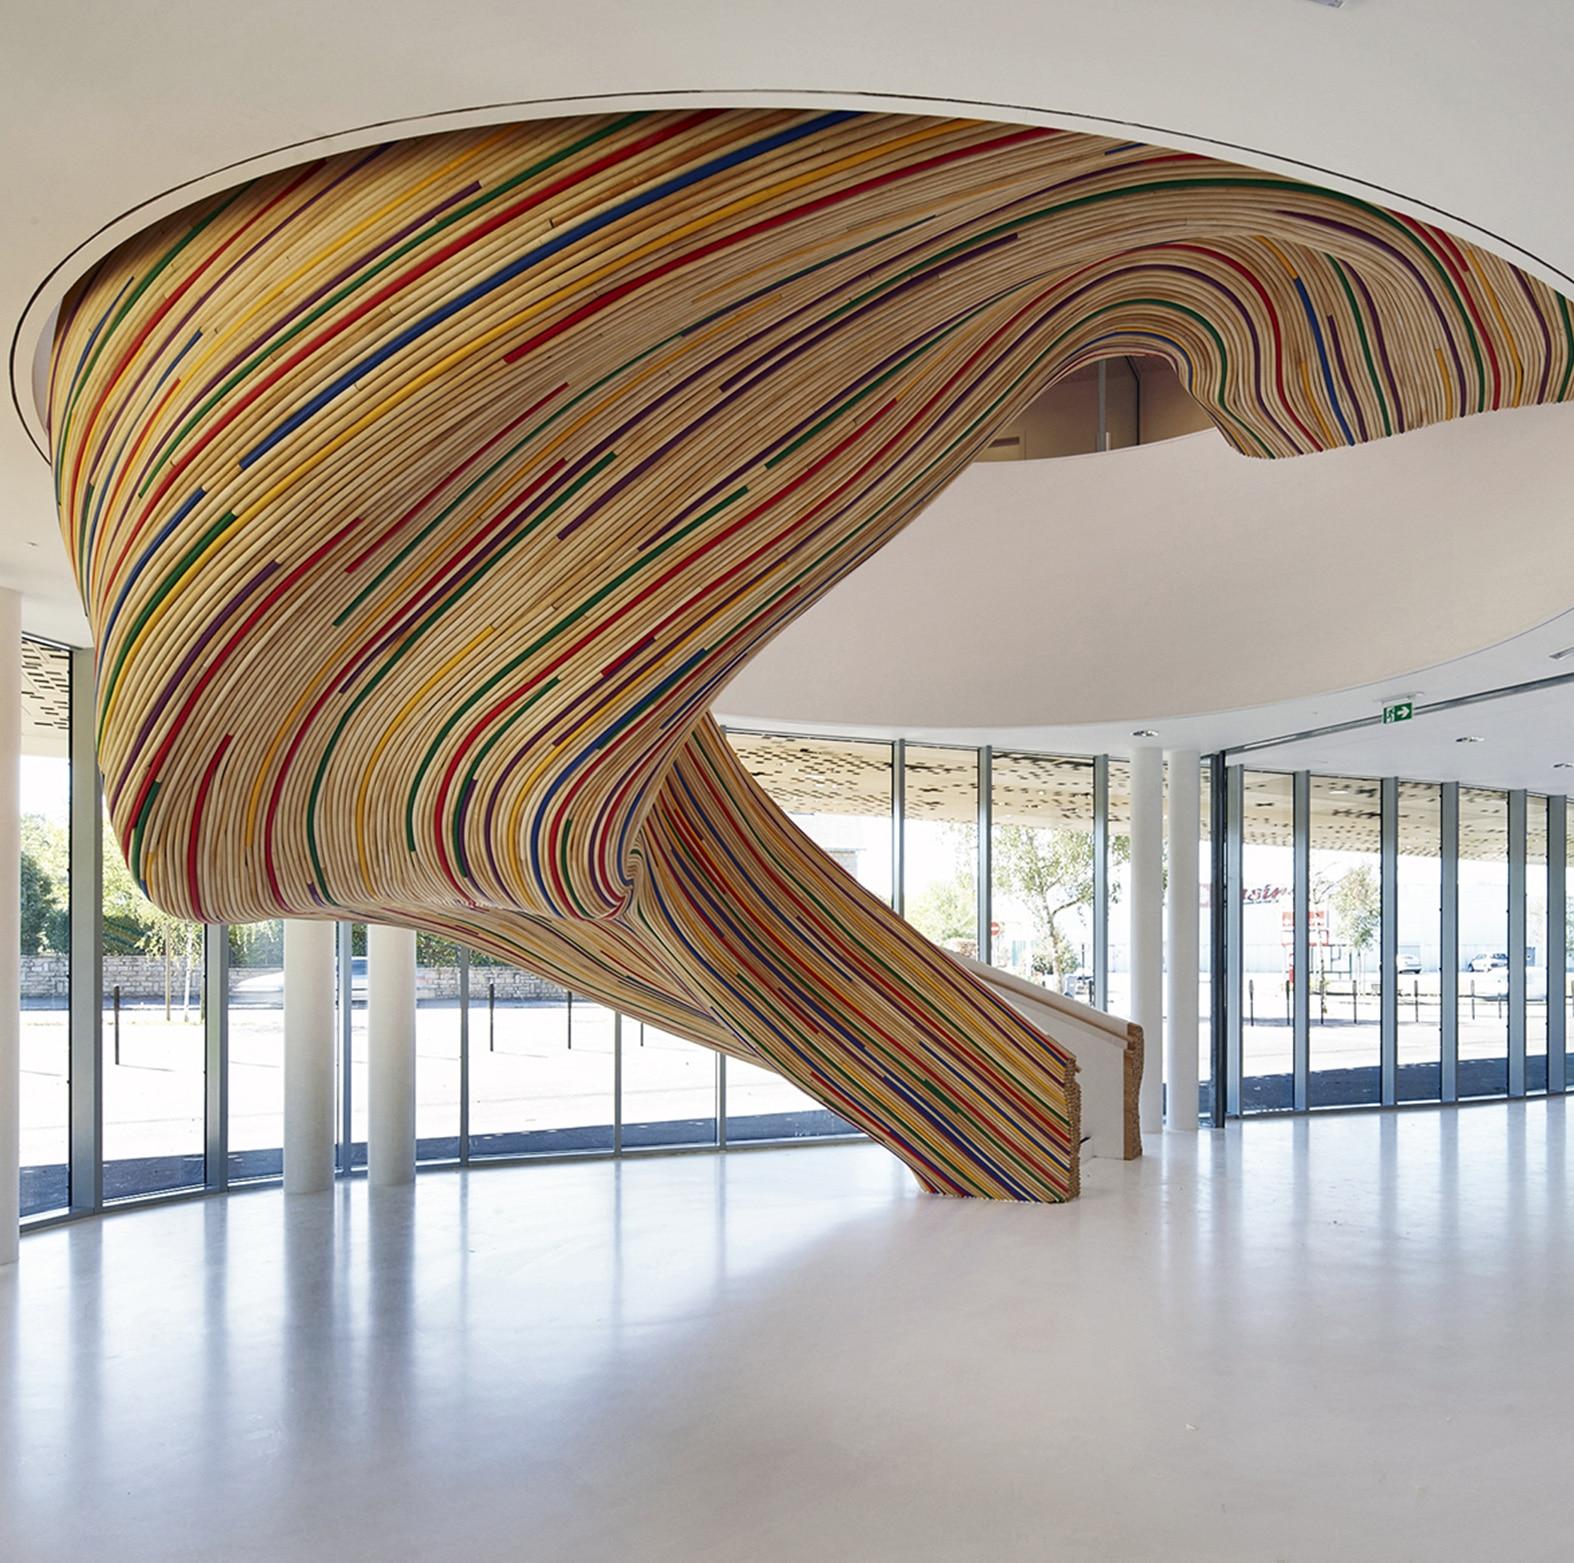 Habiller escalier en rotin m talobil agence de design for Mobilier japonais nantes